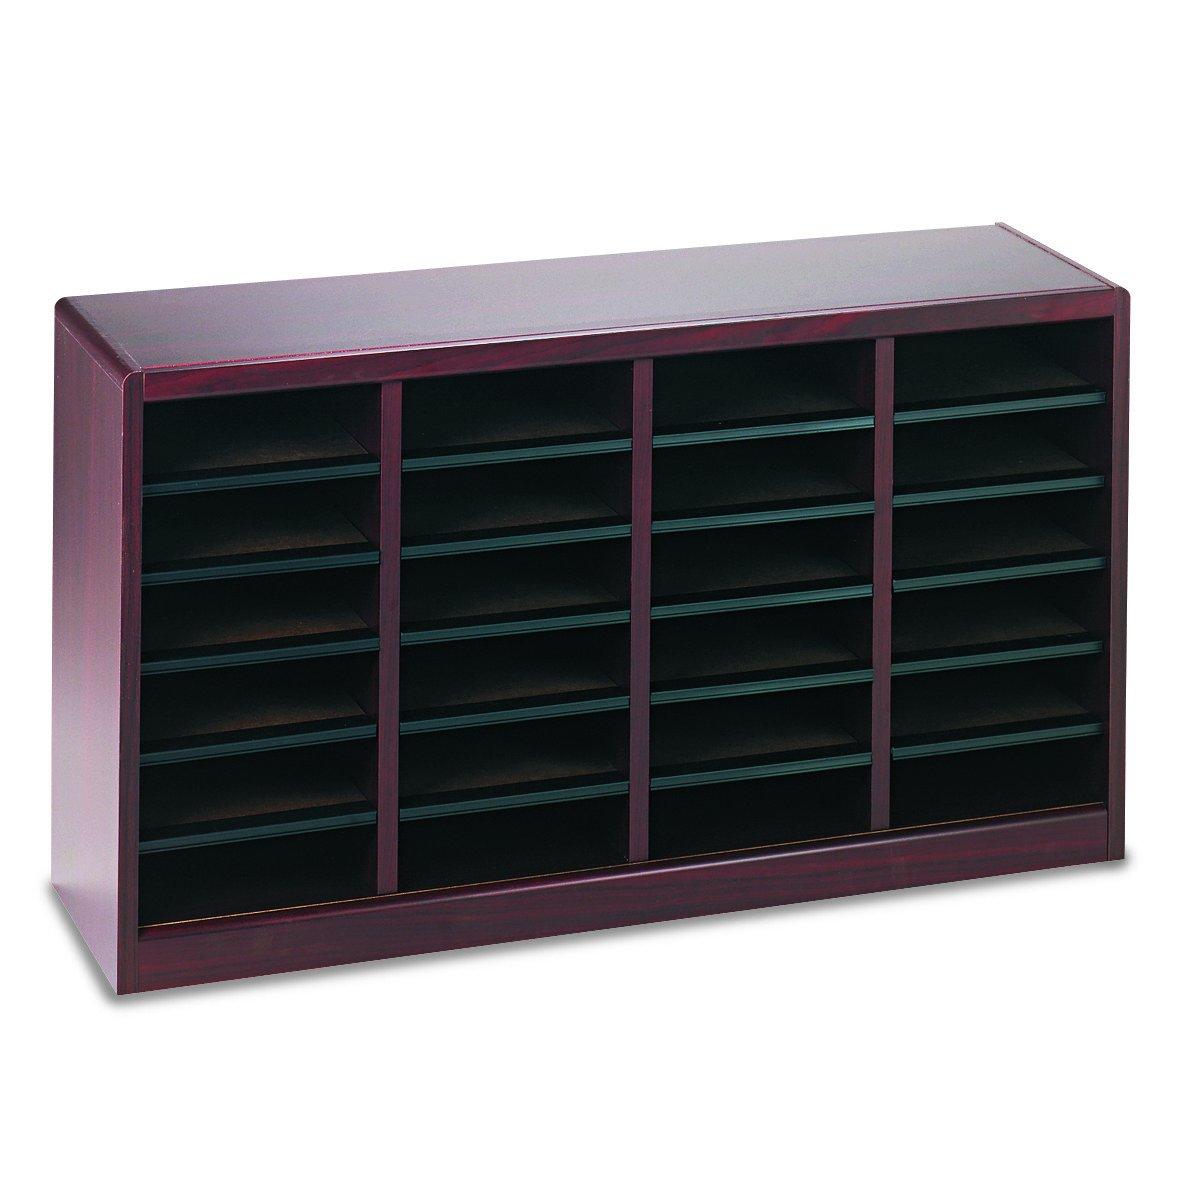 Safco Products 9311MH E-Z Stor Wood Literature Organizer, 24 Compartment, Mahogany